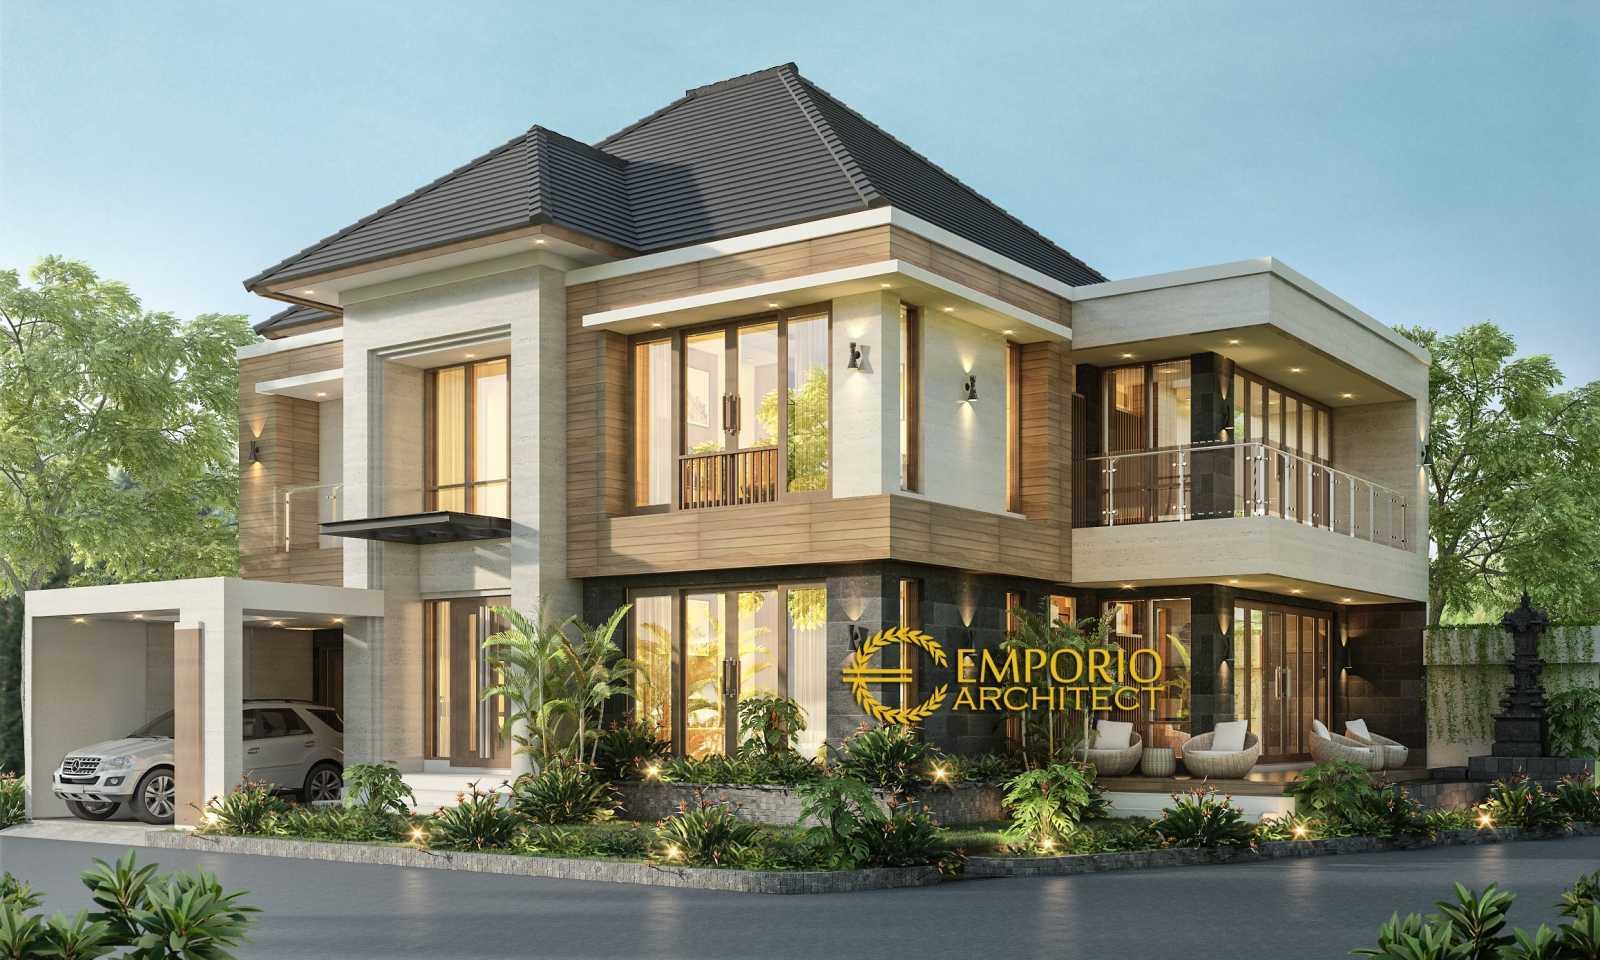 Emporio Architect Desain Rumah Modern Tropis 595 @ Mengwi, Badung, Bali Mengwi, Kec. Mengwi, Kabupaten Badung, Bali, Indonesia Mengwi, Kec. Mengwi, Kabupaten Badung, Bali, Indonesia Emporio-Architect-Desain-Rumah-Modern-Tropis-595-Mengwi-Badung-Bali Modern 76606